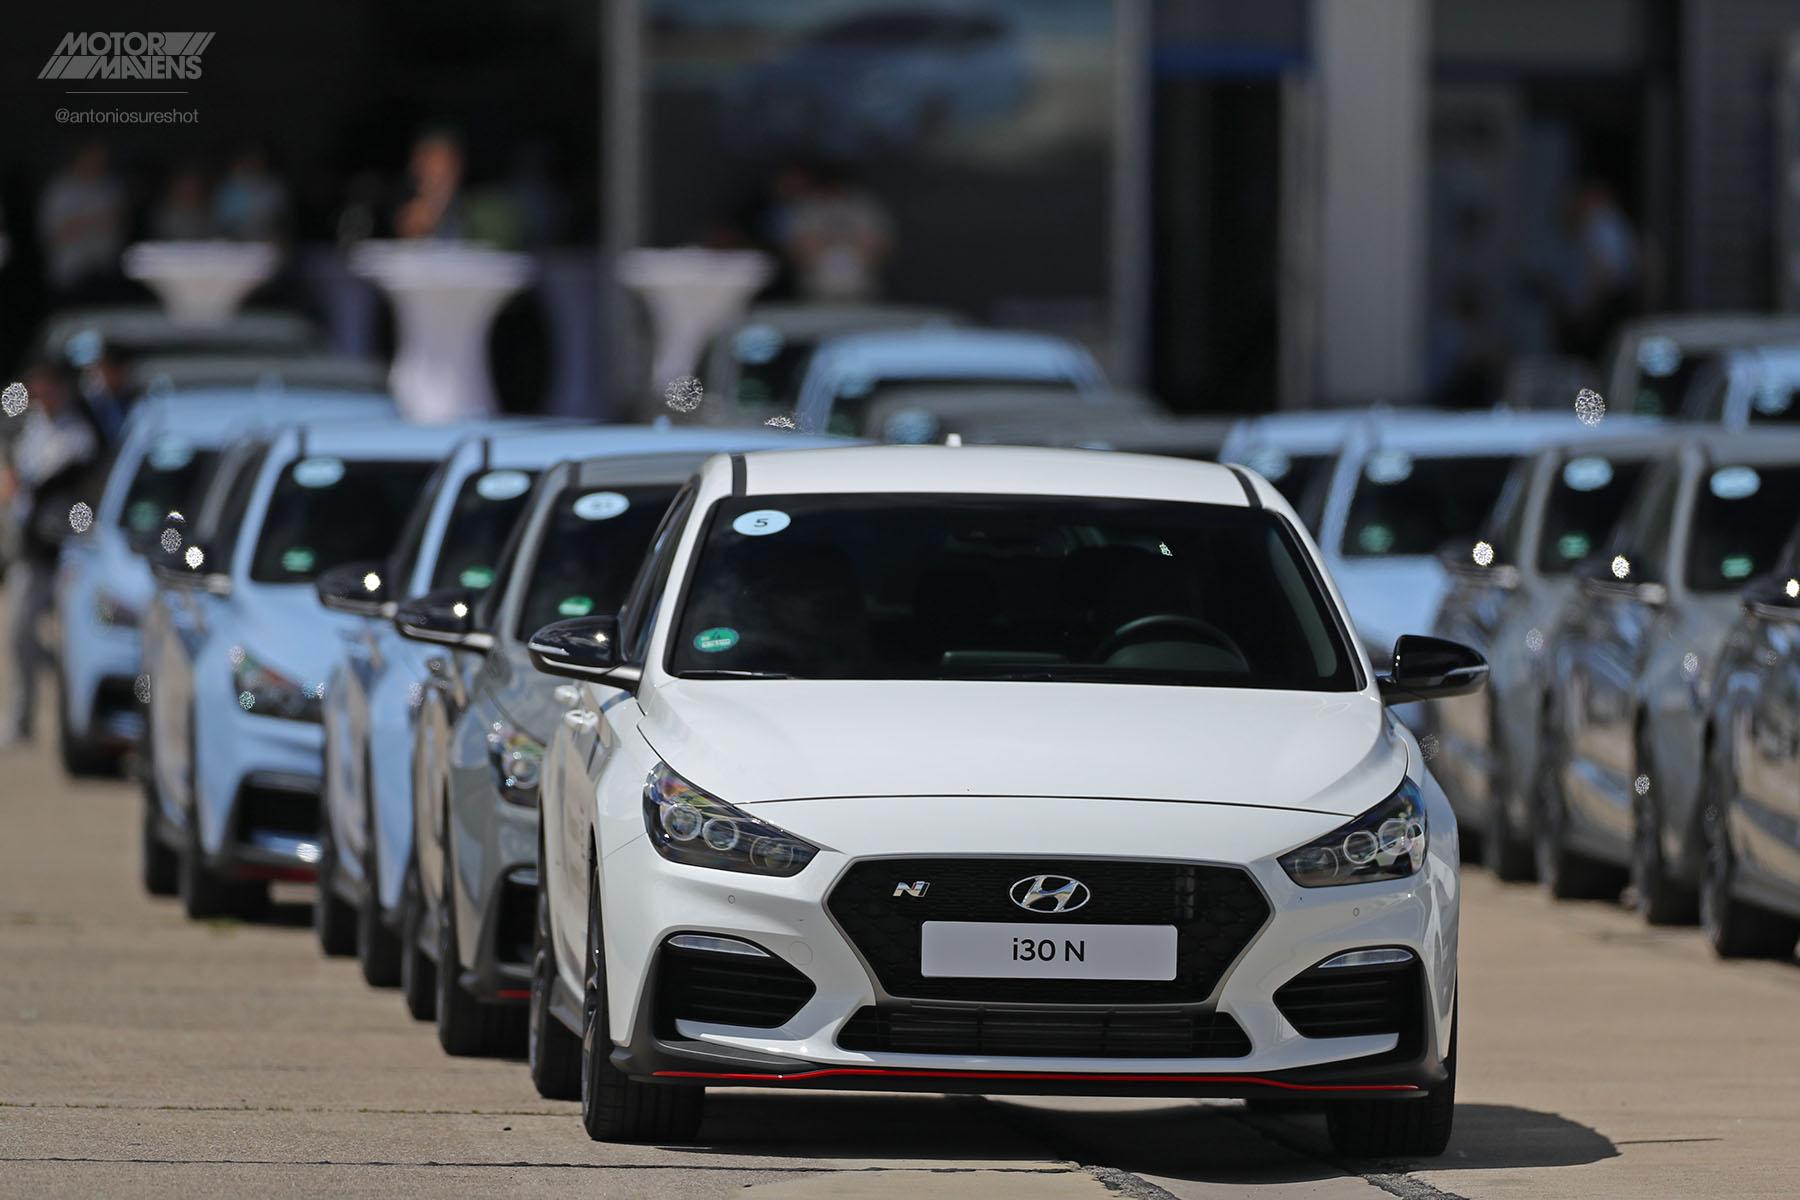 Hyundai i30N, Nurburgring, 24H of Hyundai N Experience, Hyundai N, Nurburgring 24H, i30